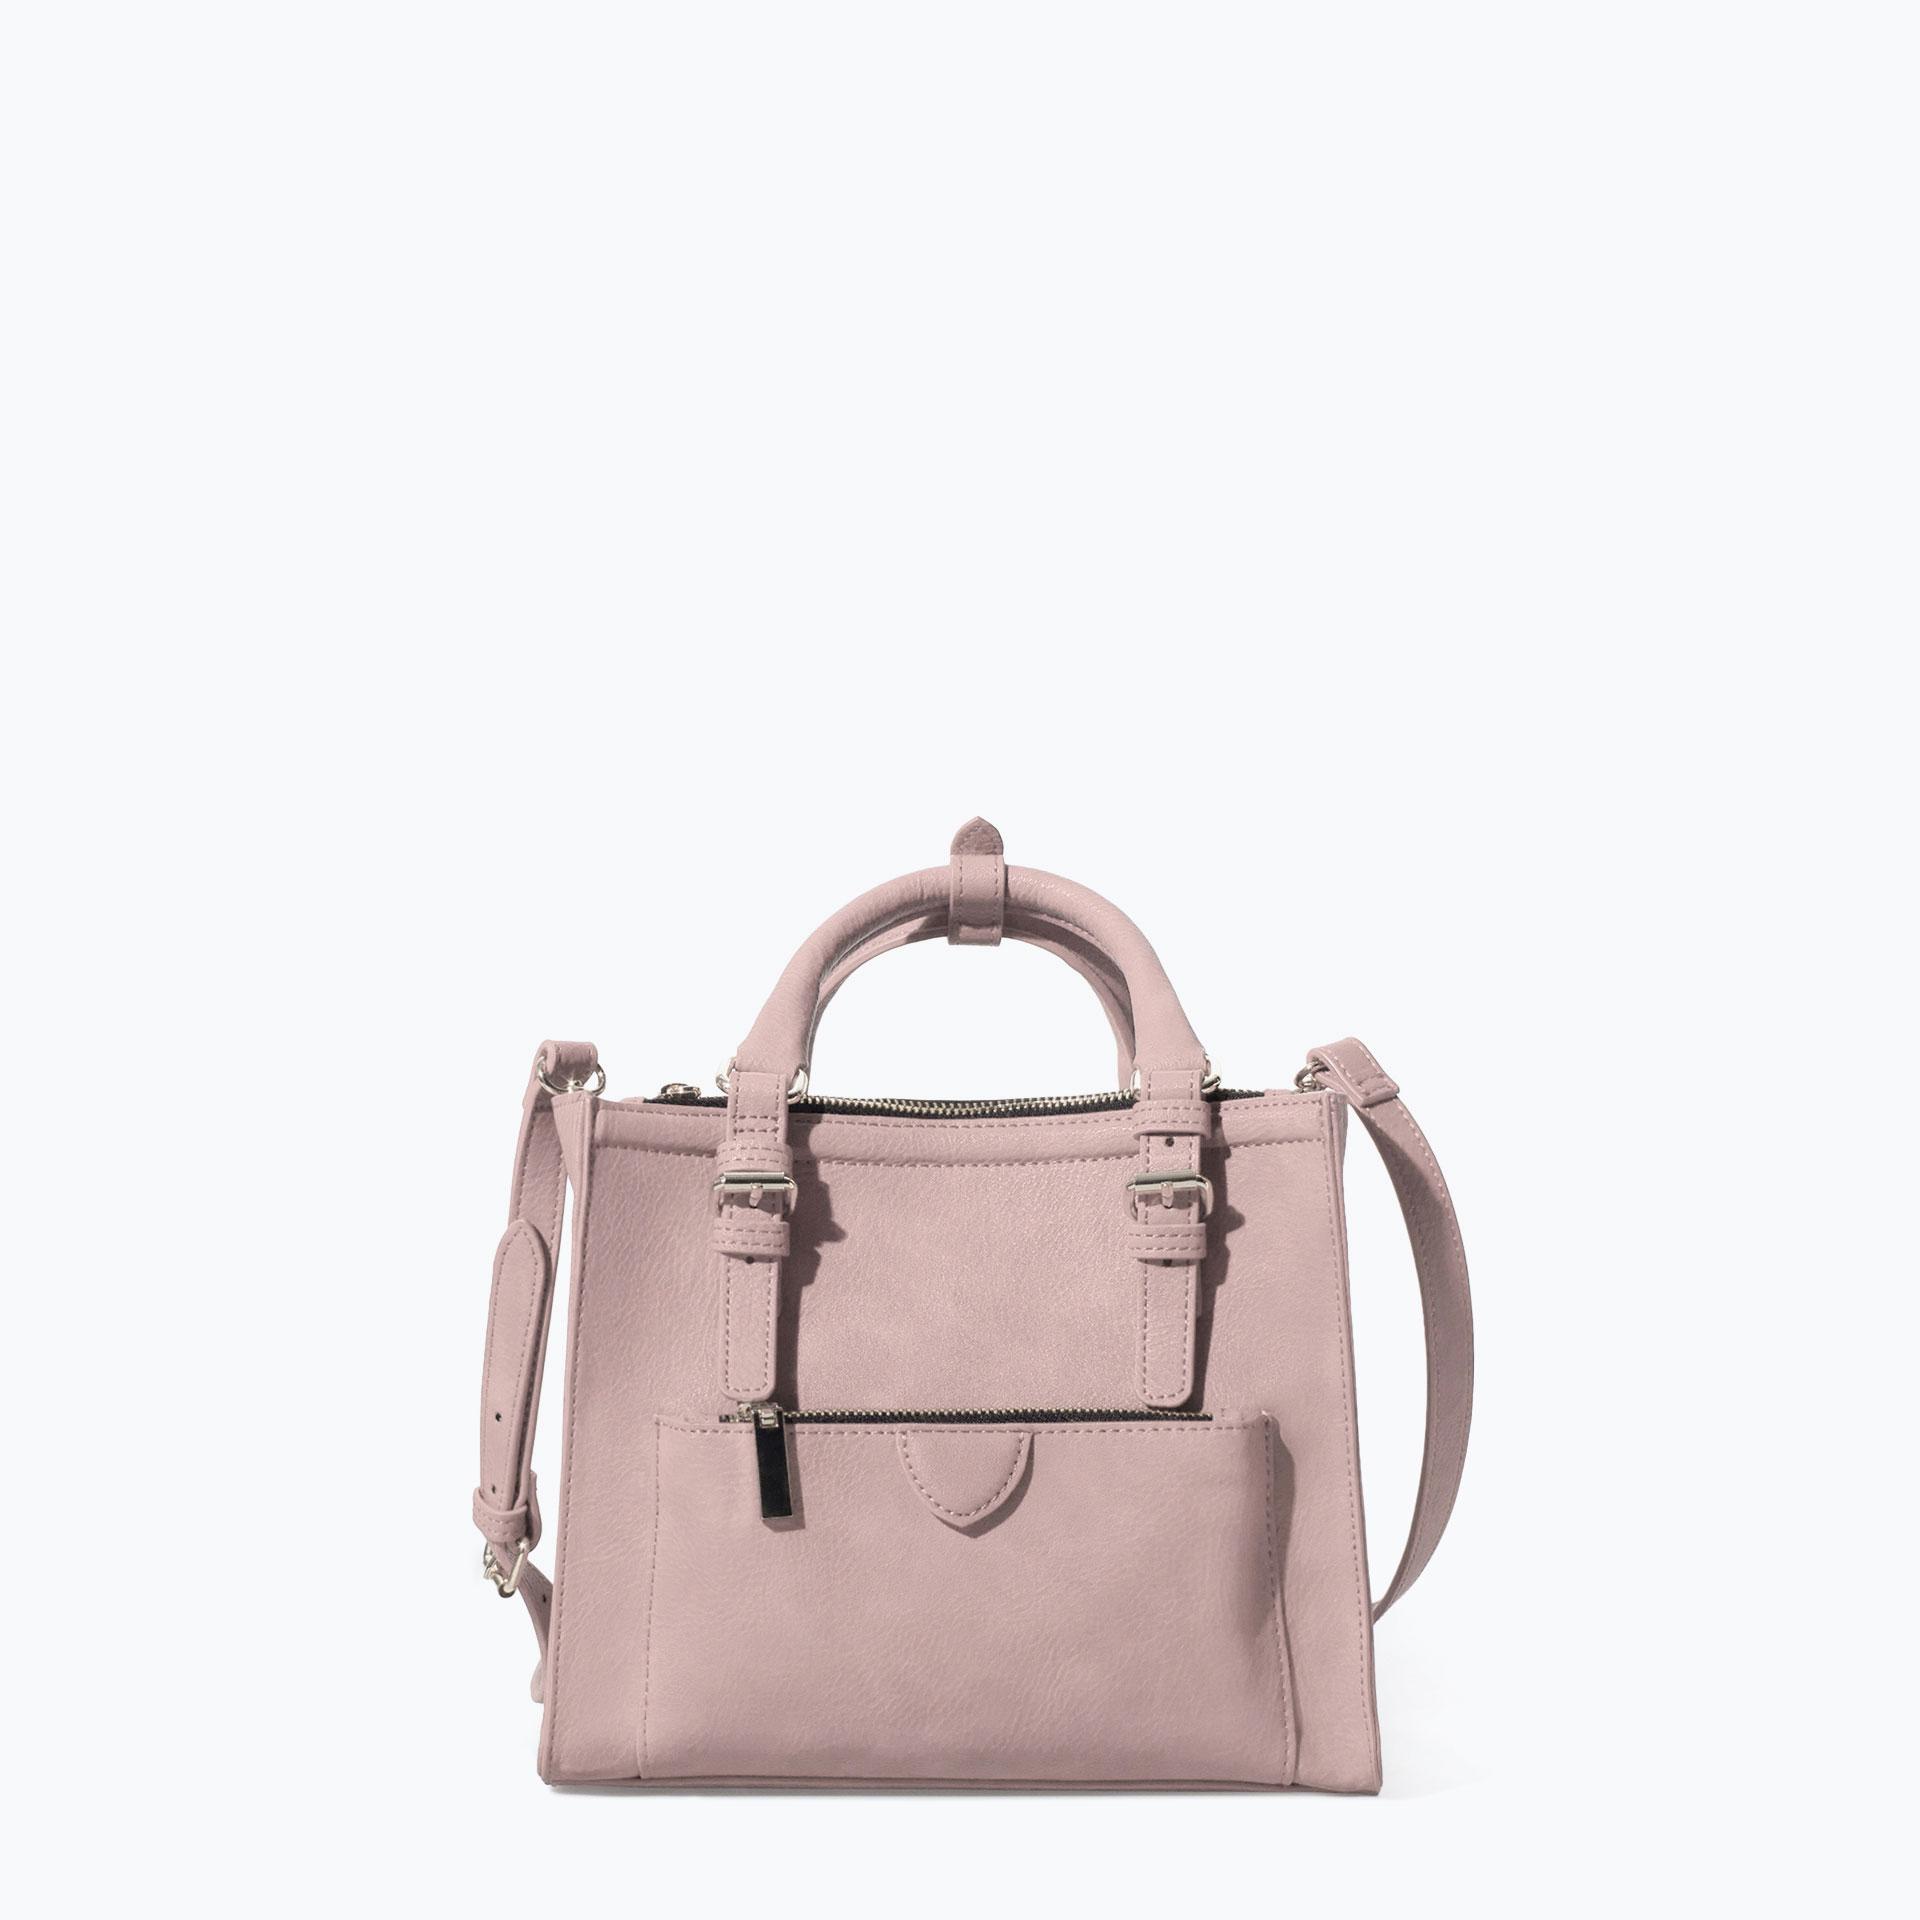 Zara Mini Crossbody Bag